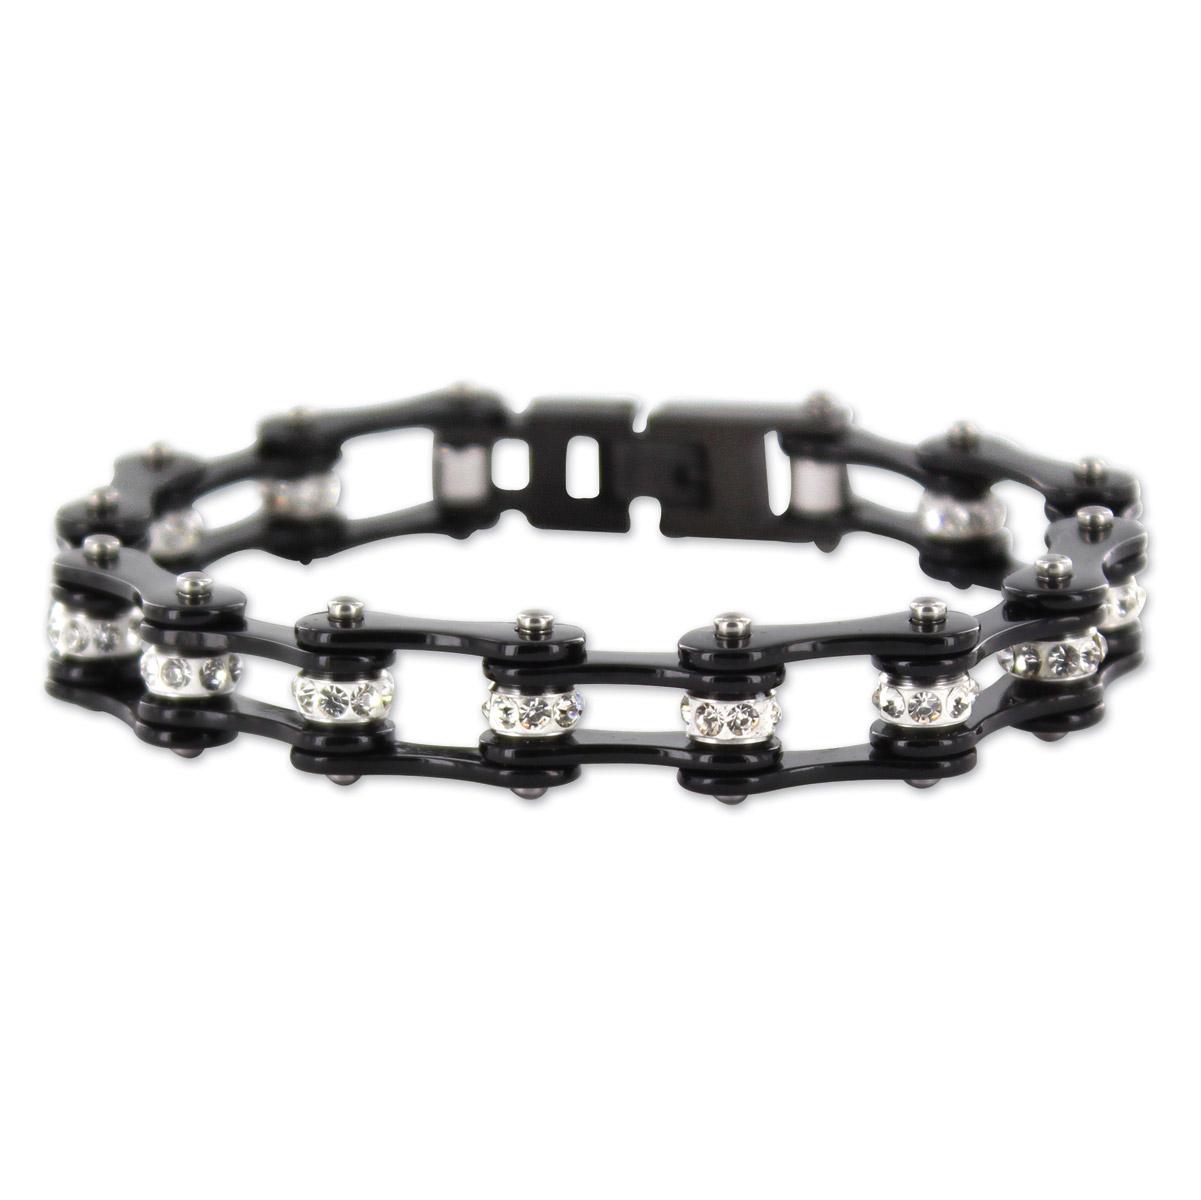 Kodiak All Black with Crystals Chain Bracelet